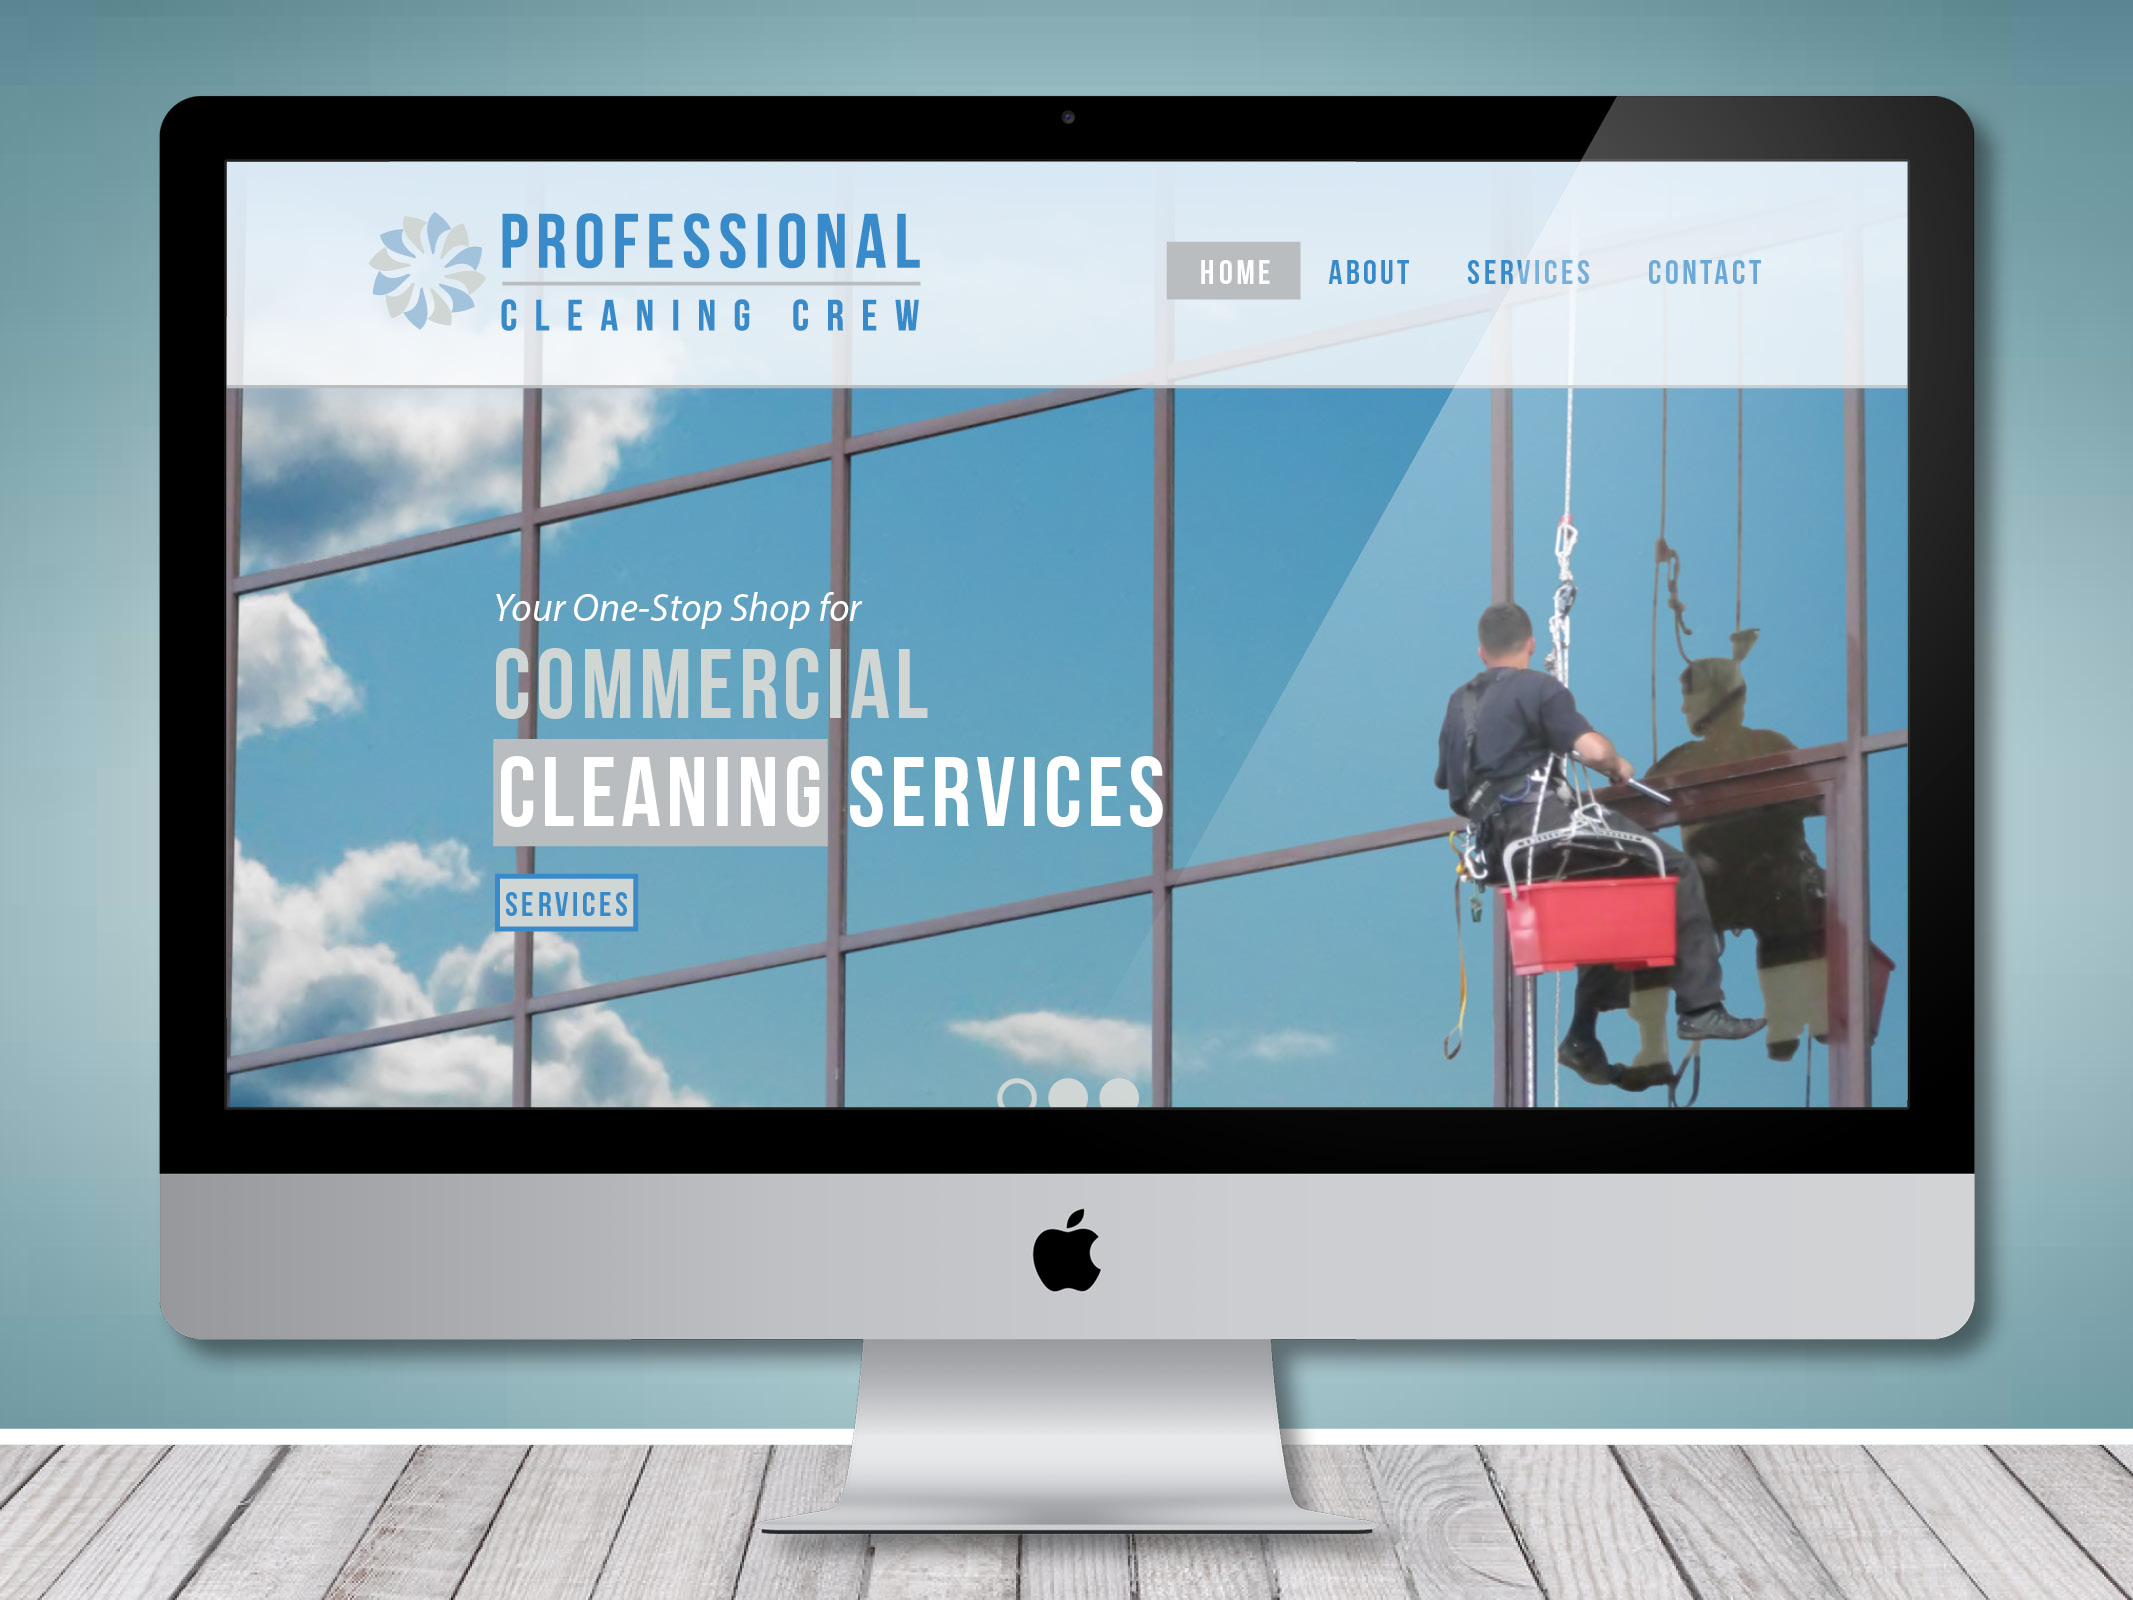 Web Design, Logo Design, Art Direction, and Branding